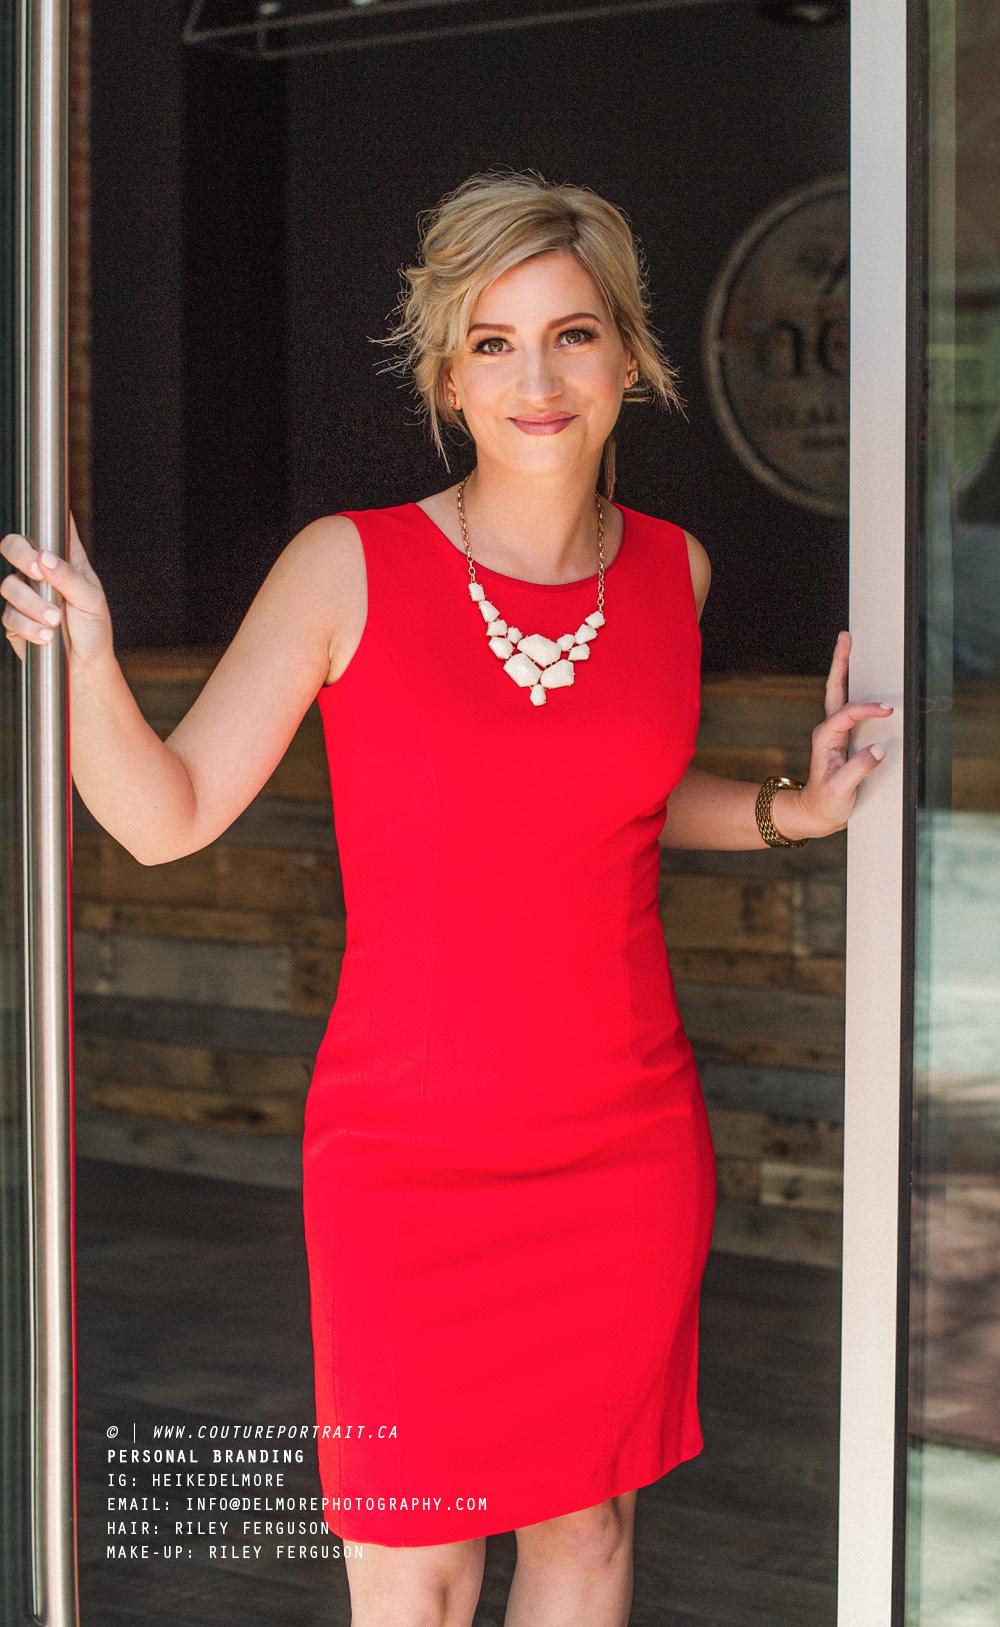 Heike Delmore Personal Branding Photography Meg Lyttle